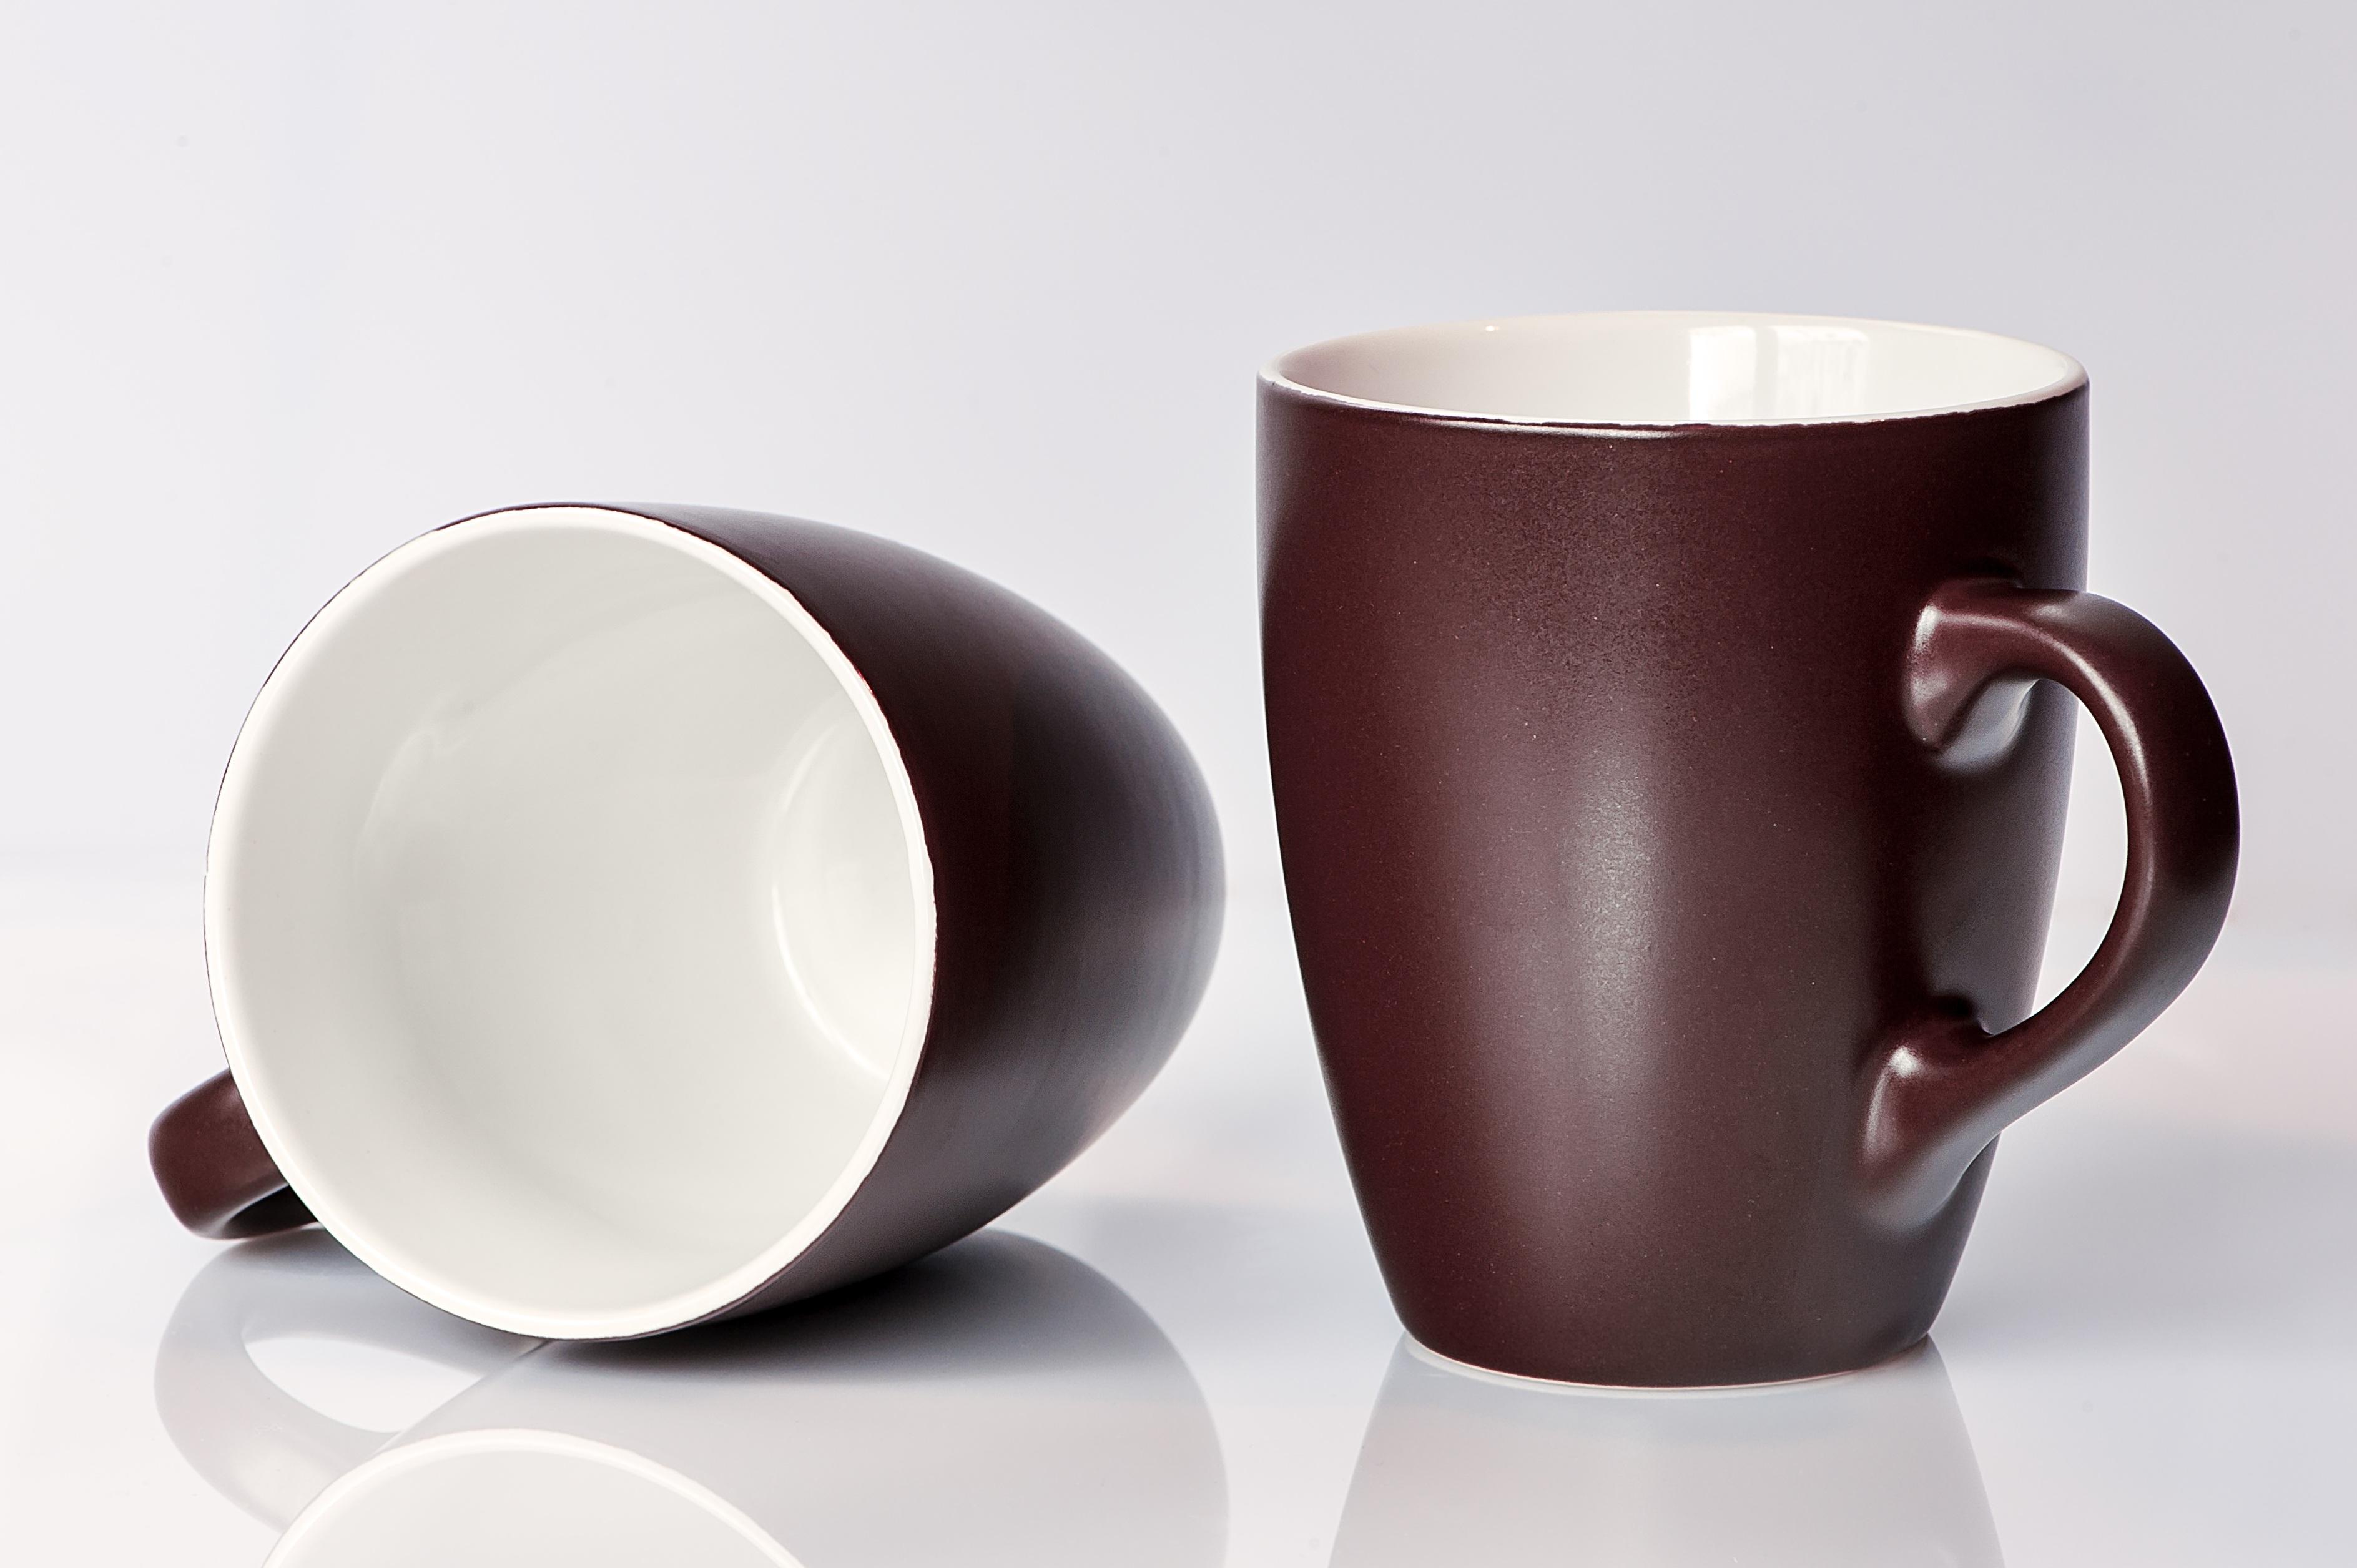 White Cup Saucer Ceramic Brown Drink Breakfast Espresso Mug Coffee Tableware Caffeine T Porcelain Cover